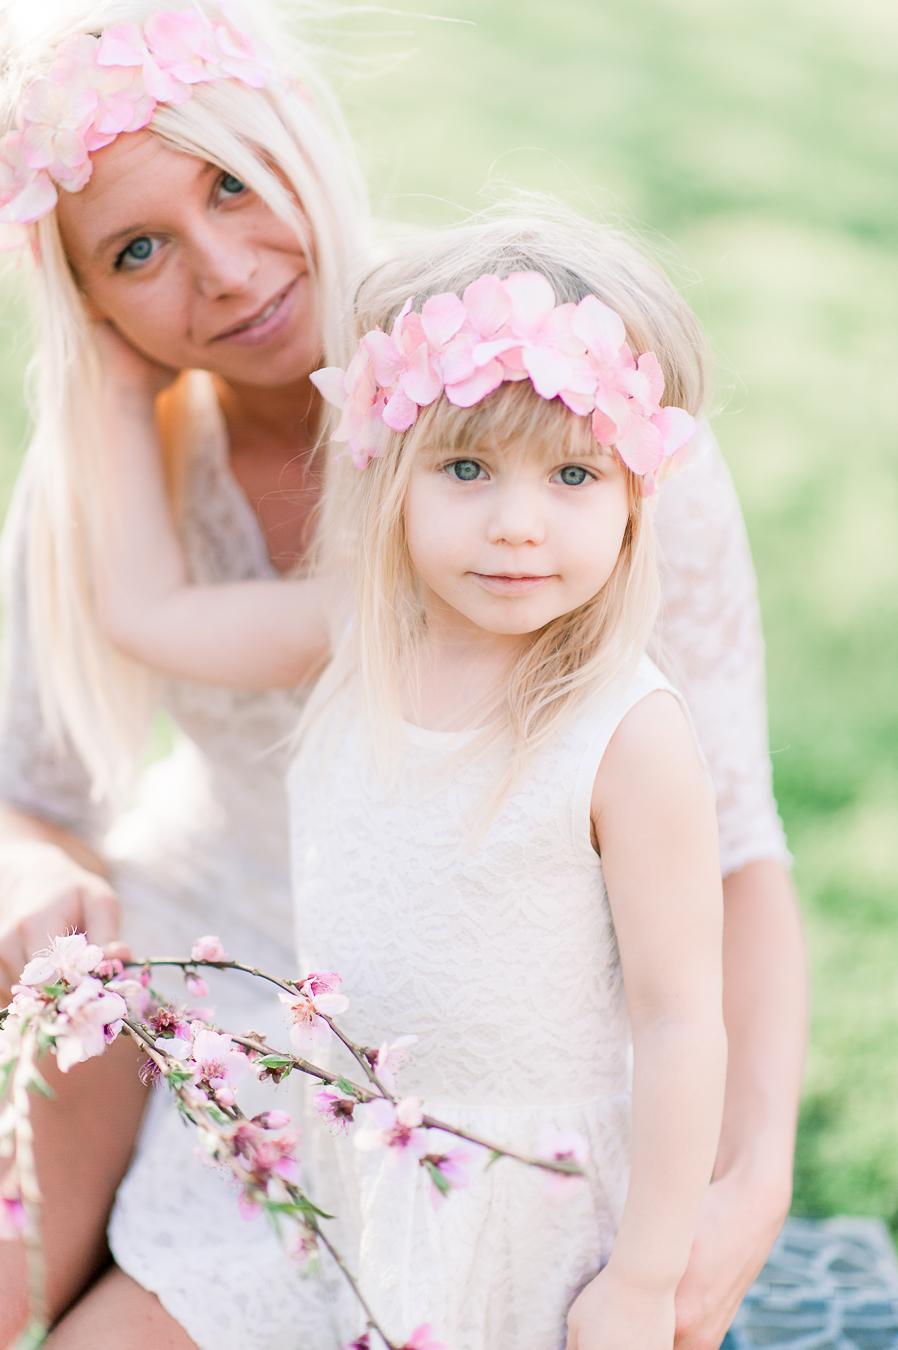 fredericksburgphotographer_cherryblossoms_MomandMe_familyphotos_youseephotography_Sarahfam (38).JPG